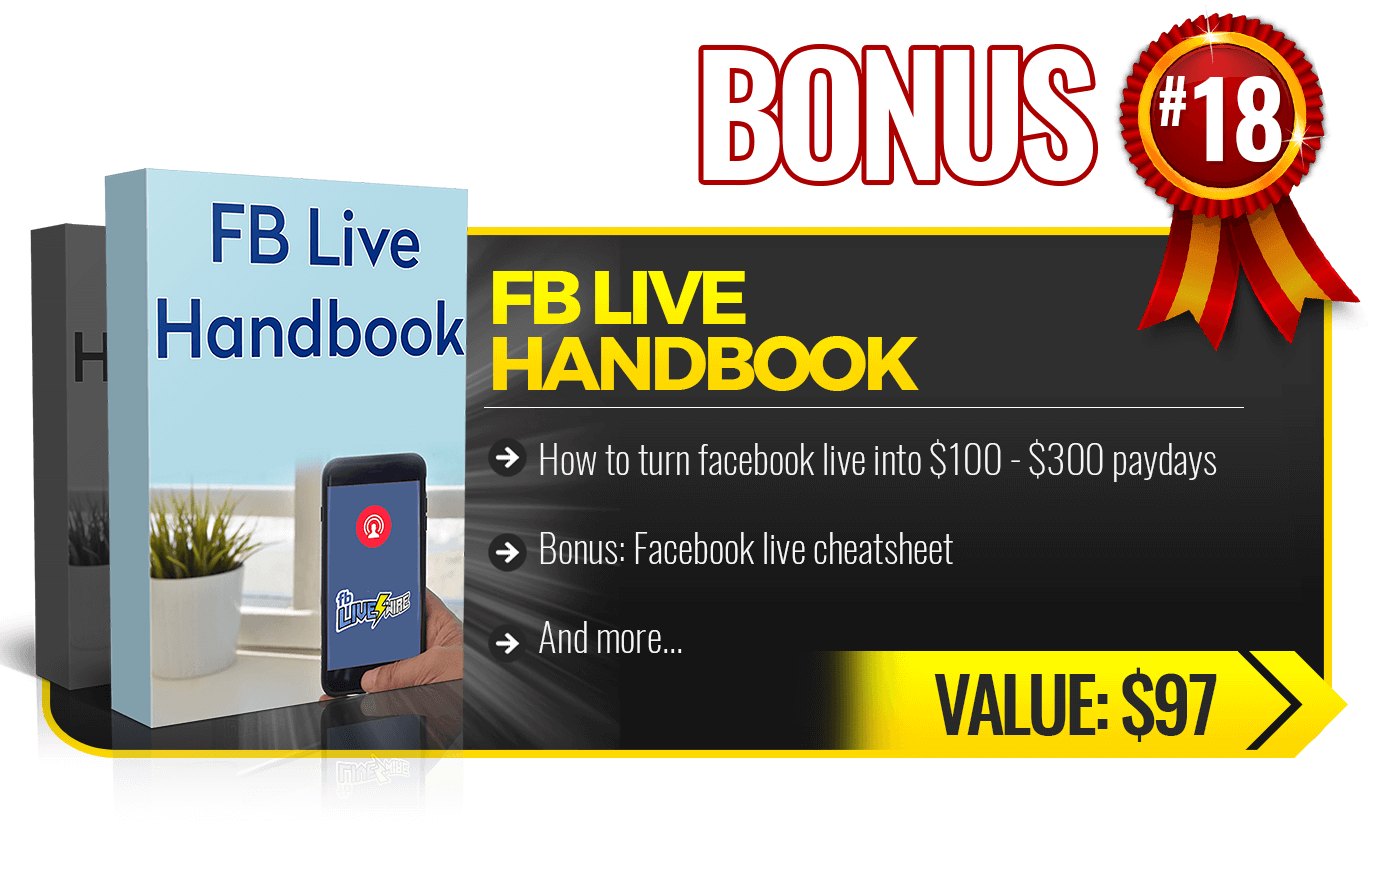 18. FB Live